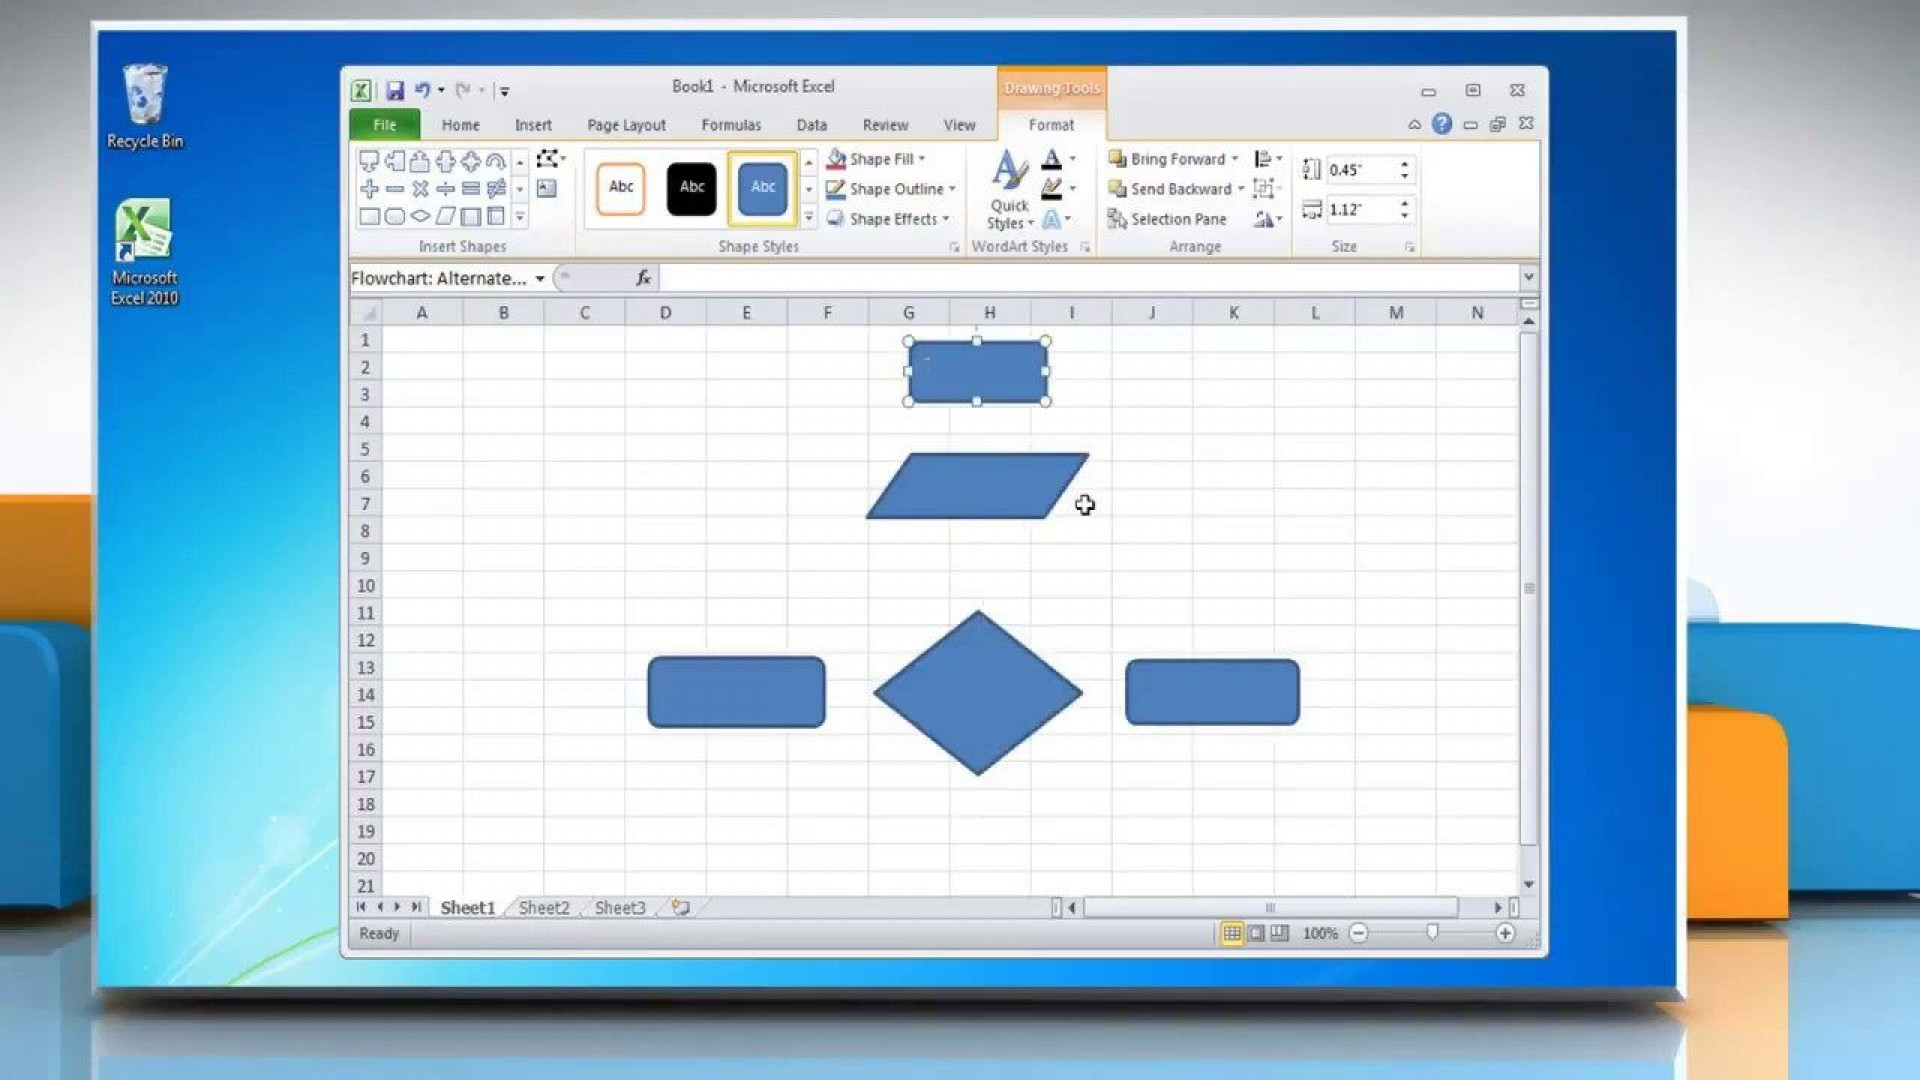 003 Stunning Swimlane Proces Map Template Excel Idea 1920